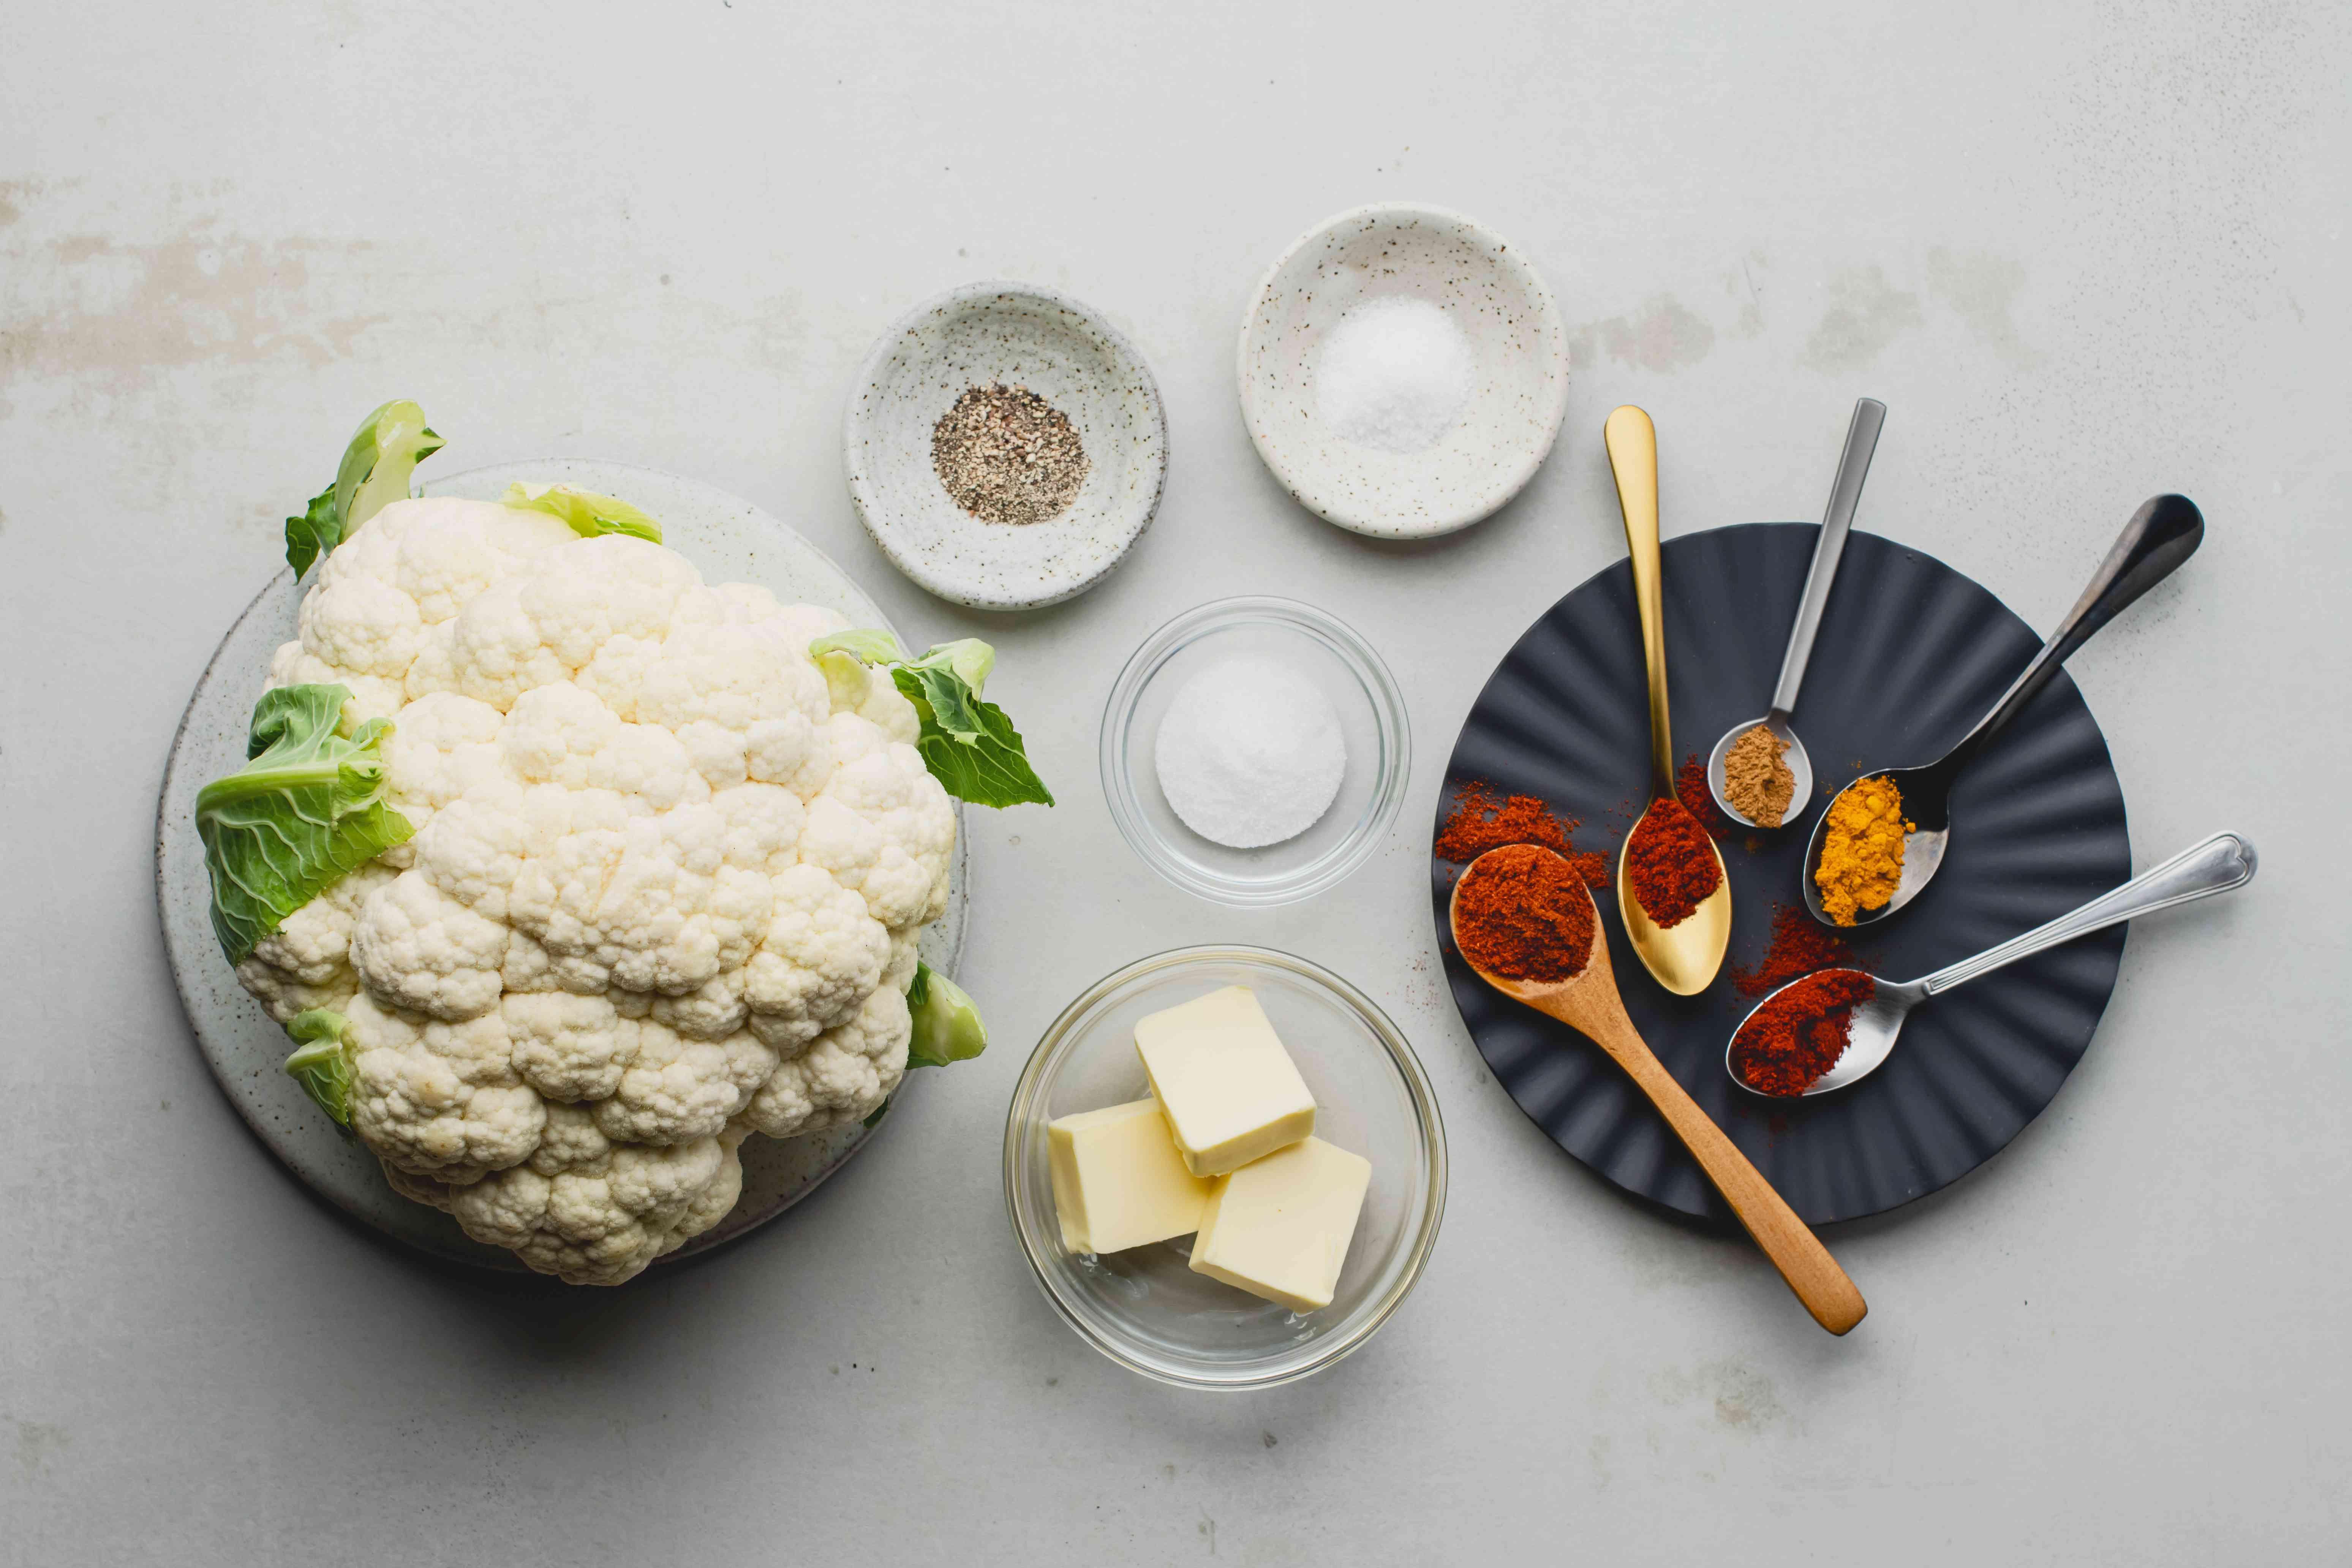 Ingredients for roasted cauliflower